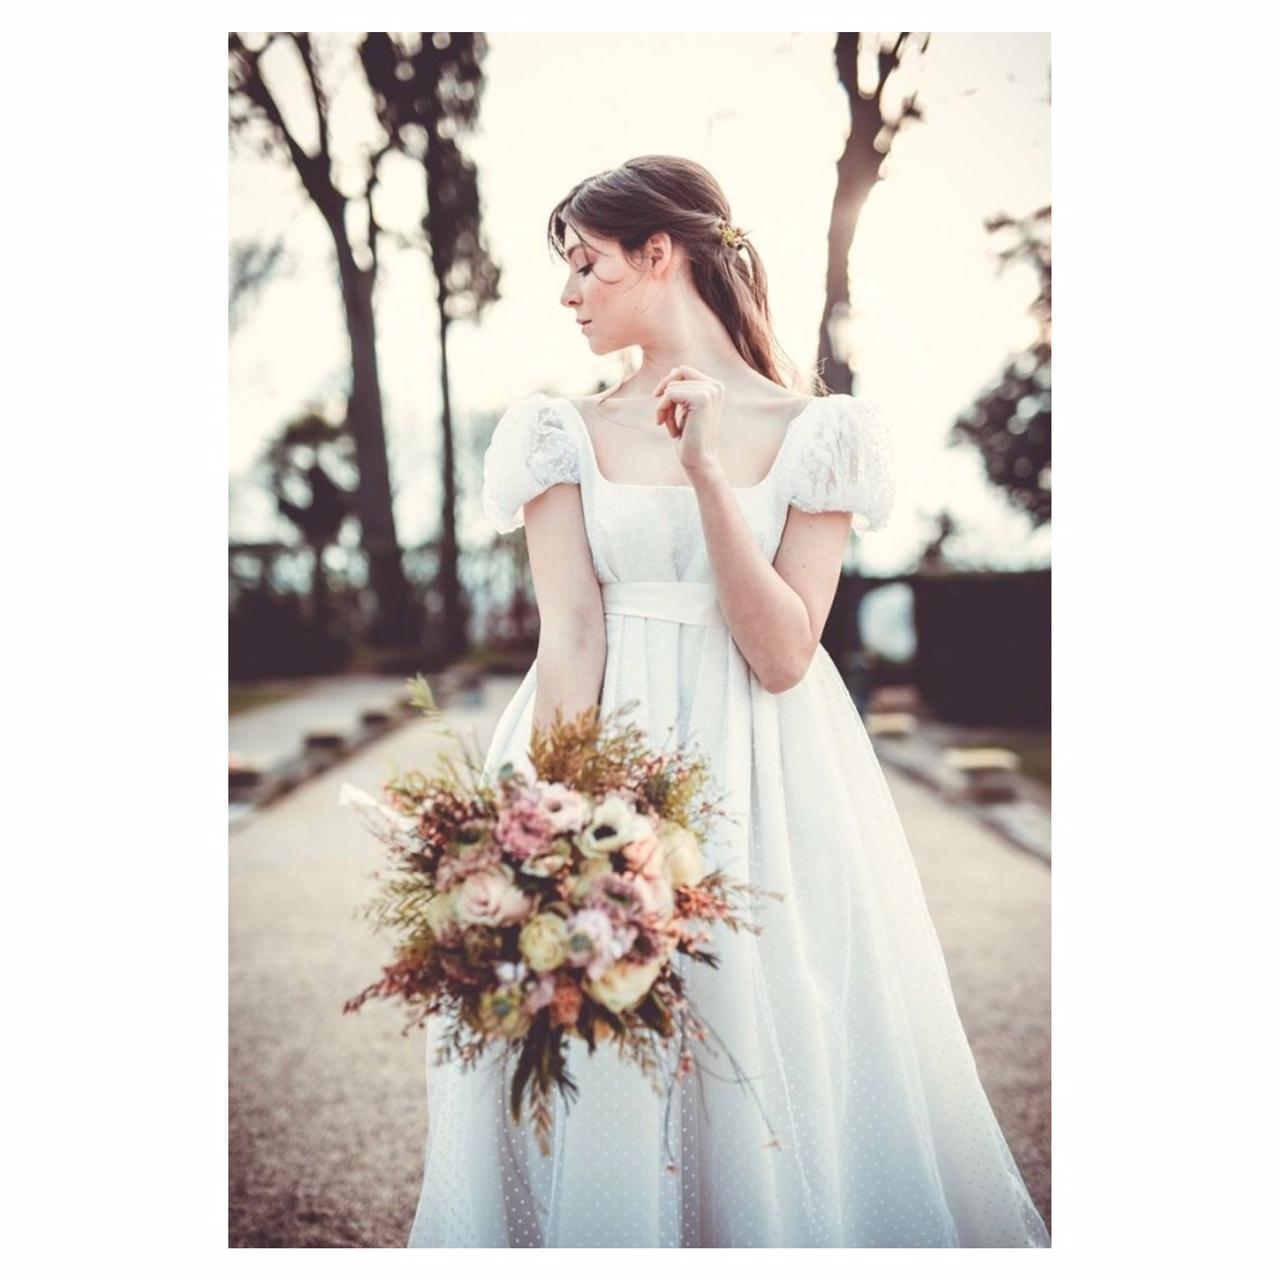 trucco sposa 2021 Fabienne Rea make up artist